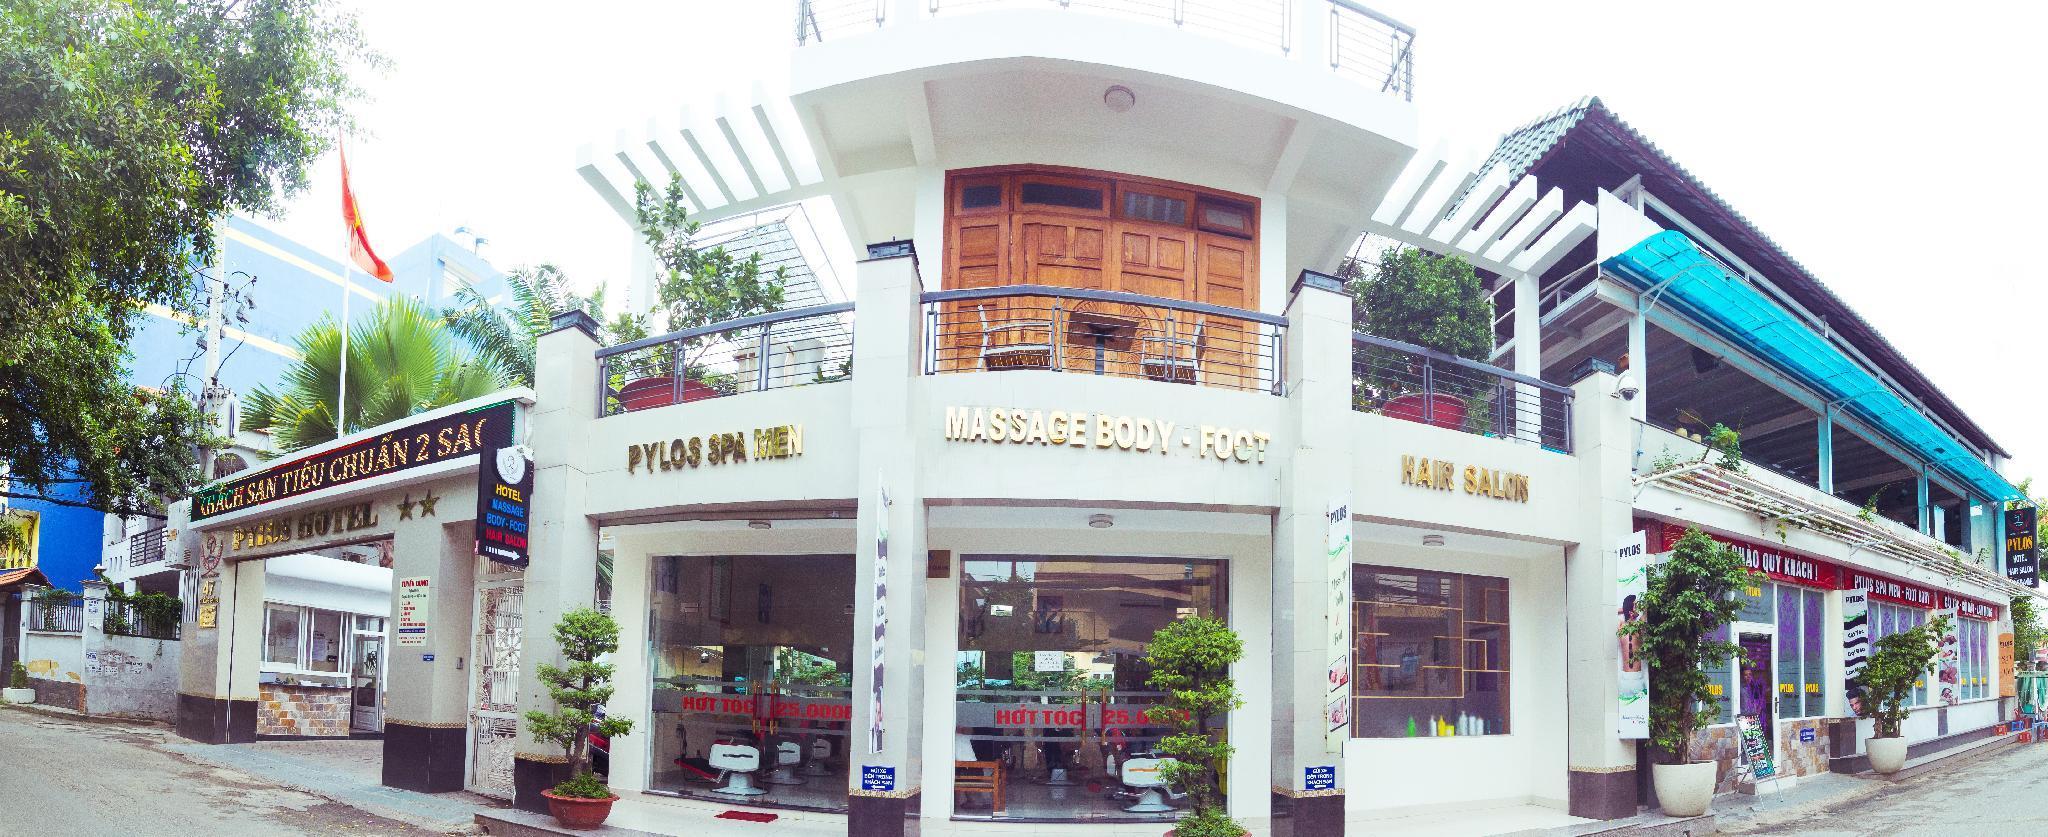 Pylos Hotel, Gò Vấp